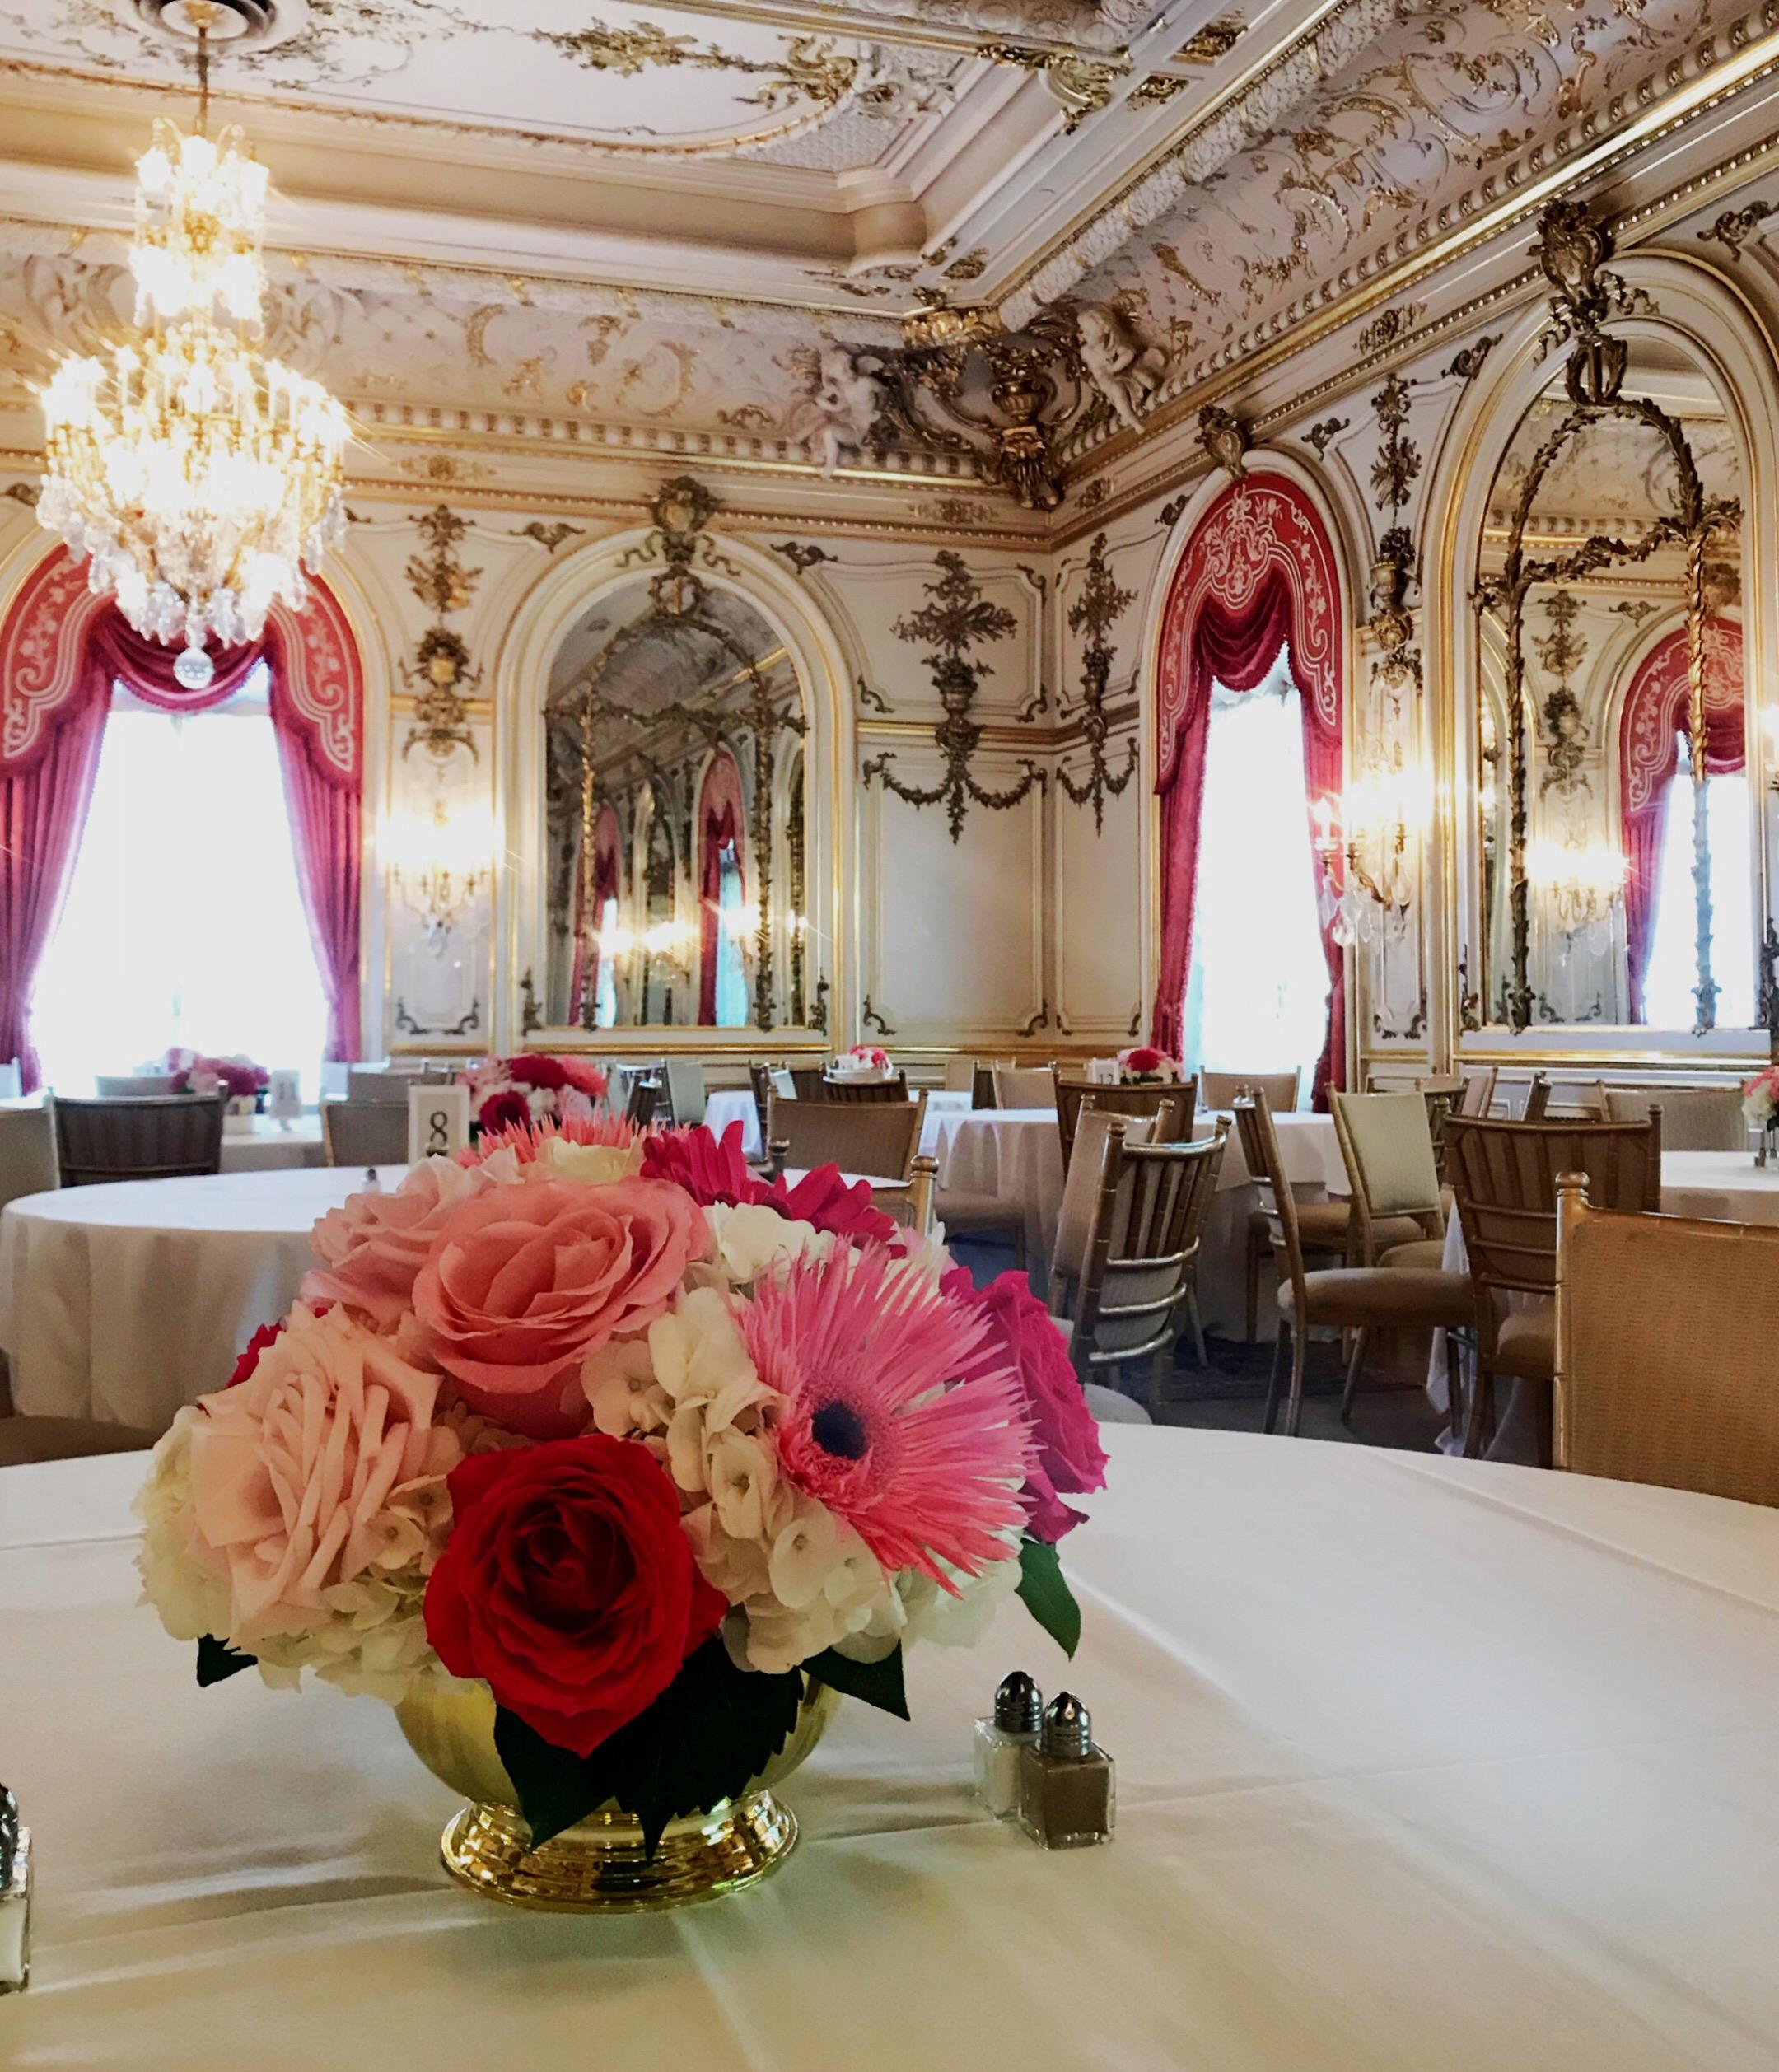 Atelier Ashley Flowers Washington DC Florist + Sarasota Florist + Tahoe Florist + Wedding Florist + Corporate Flowers + Washingtonian Weddings + @atelierashleyflowers + Cosmos Club